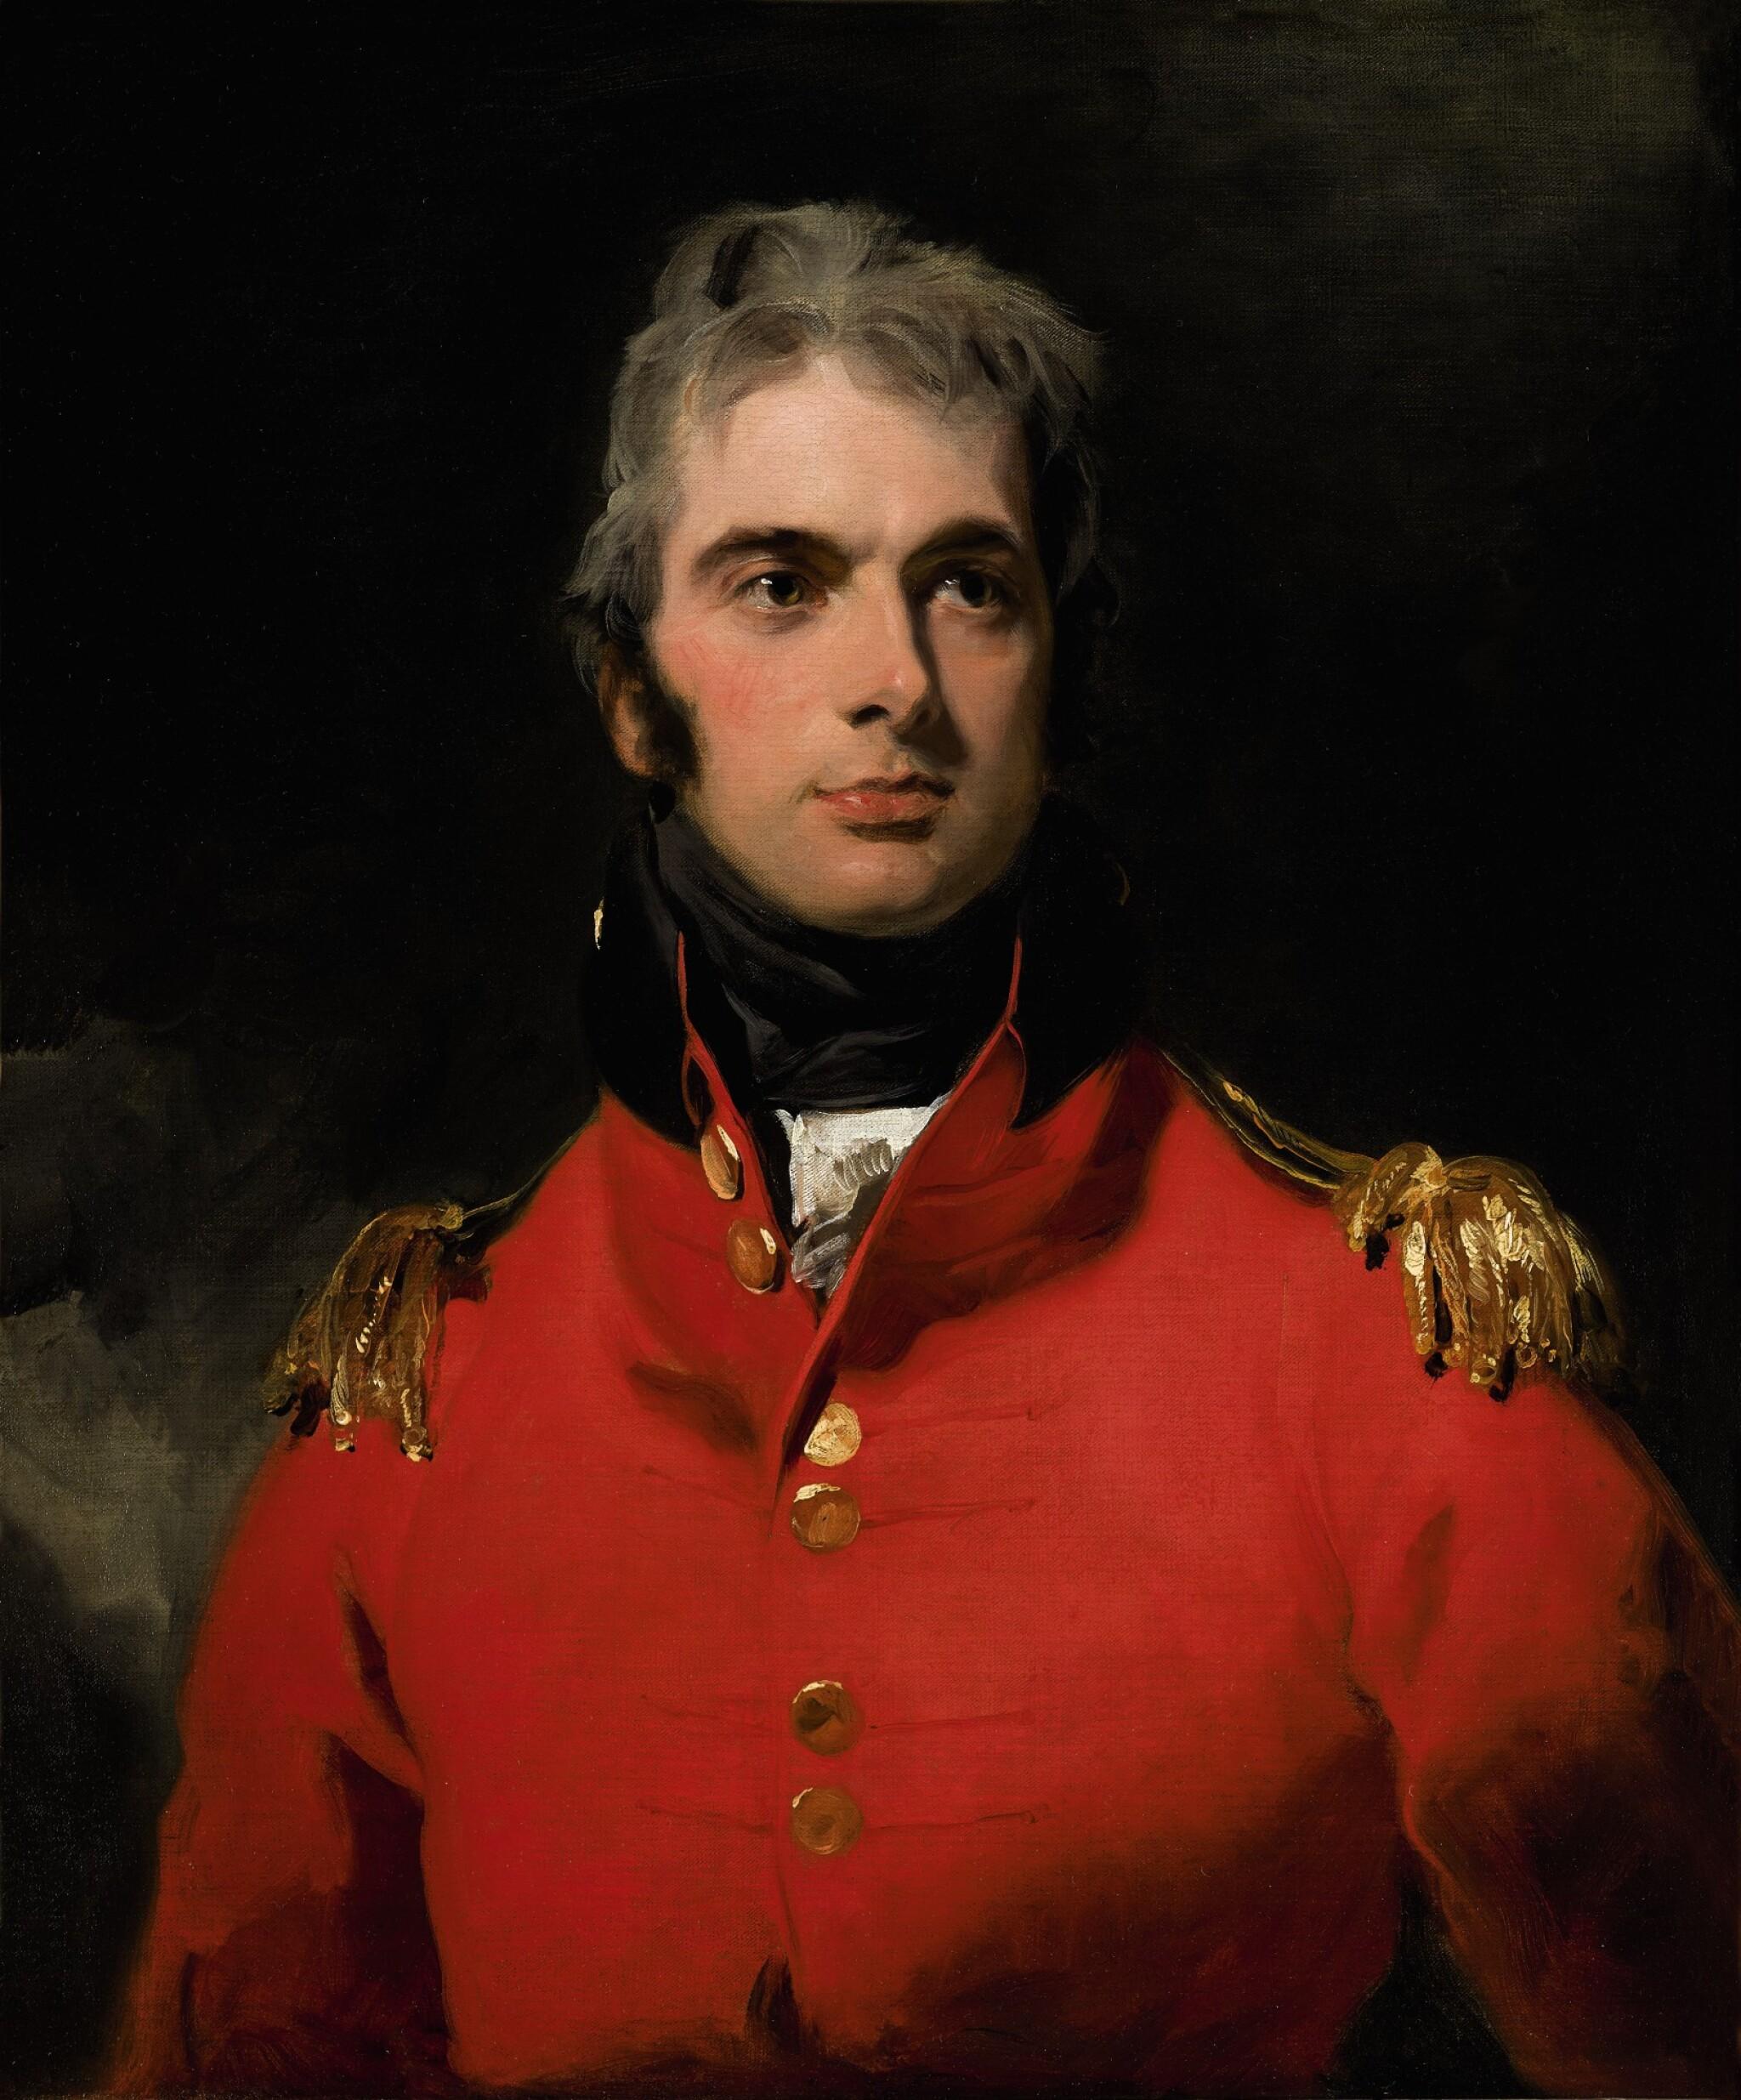 View 1 of Lot 30. Portrait of Lieutenant-General Sir Herbert Taylor (1775–1839) |《英國陸軍中將賀伯・泰勒(1775-1839)肖像》.